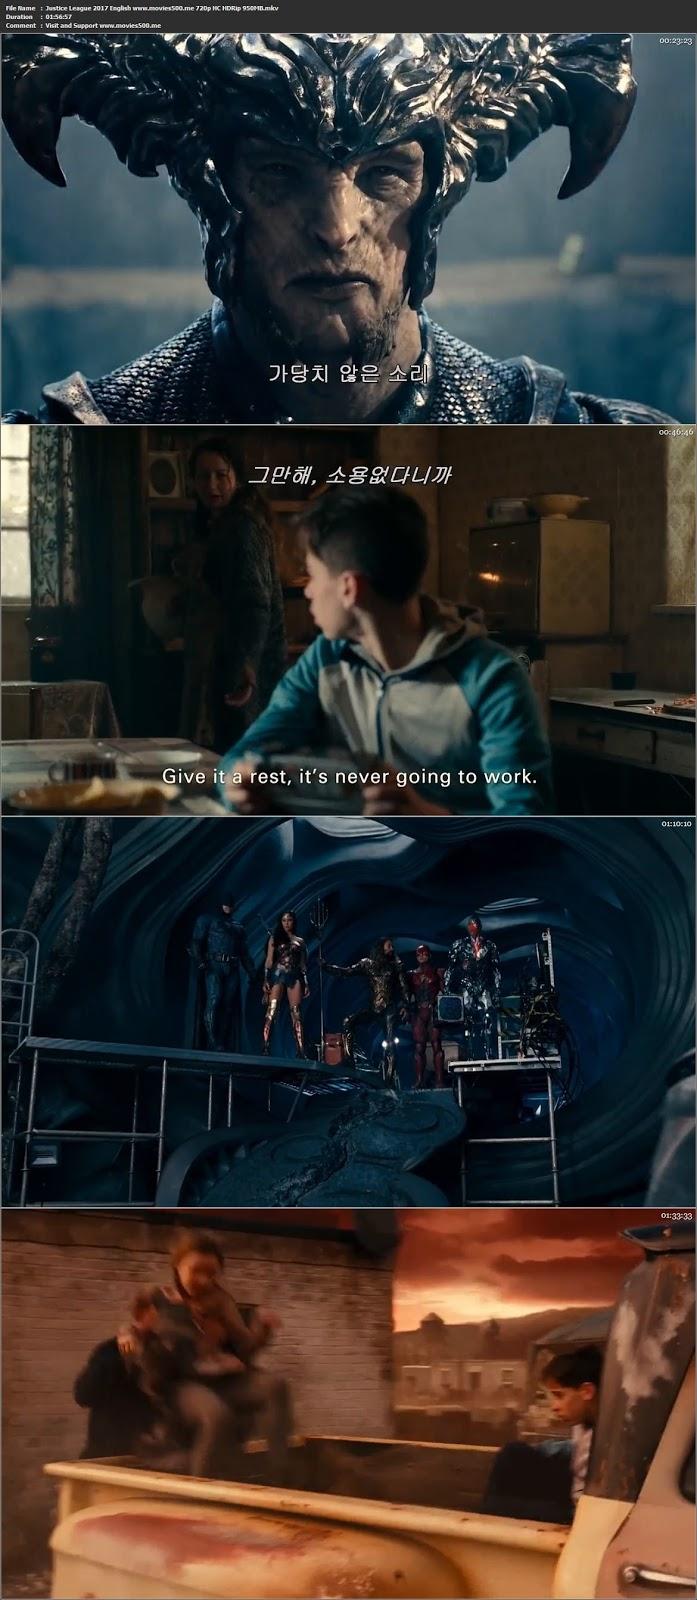 Justice League 2017 English Full Movie 900MB HDRip 720p at newbtcbank.com